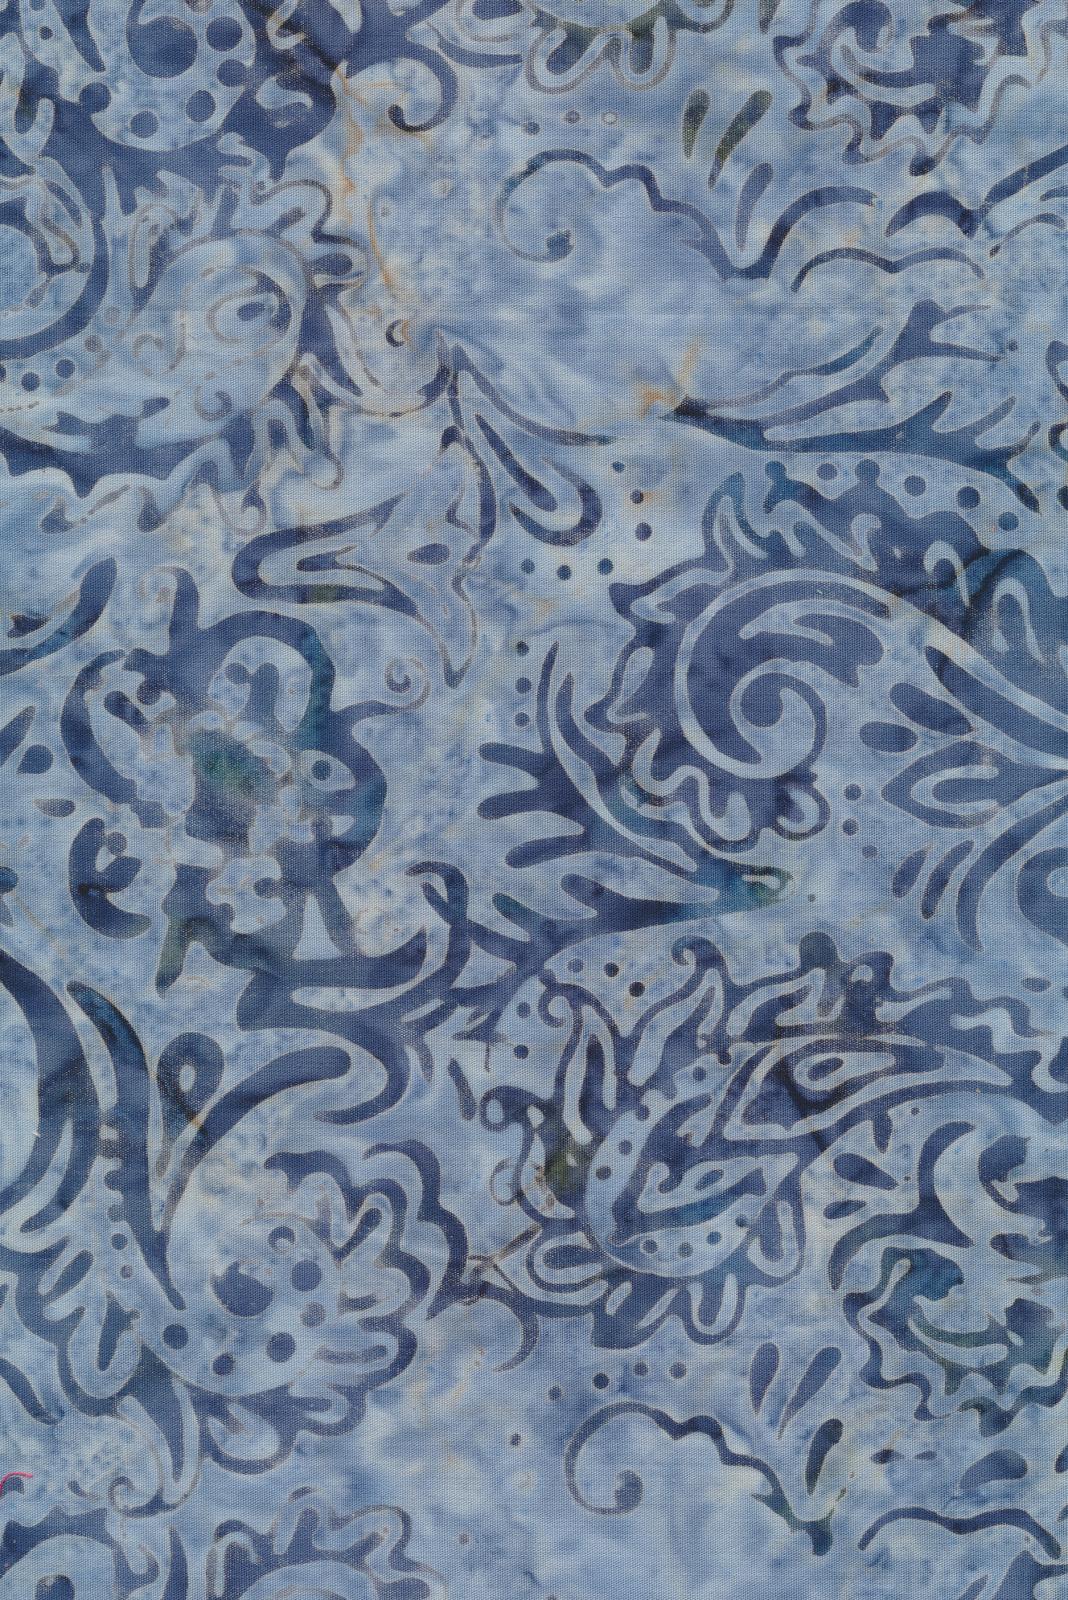 Majestic Batik - Indigo 463